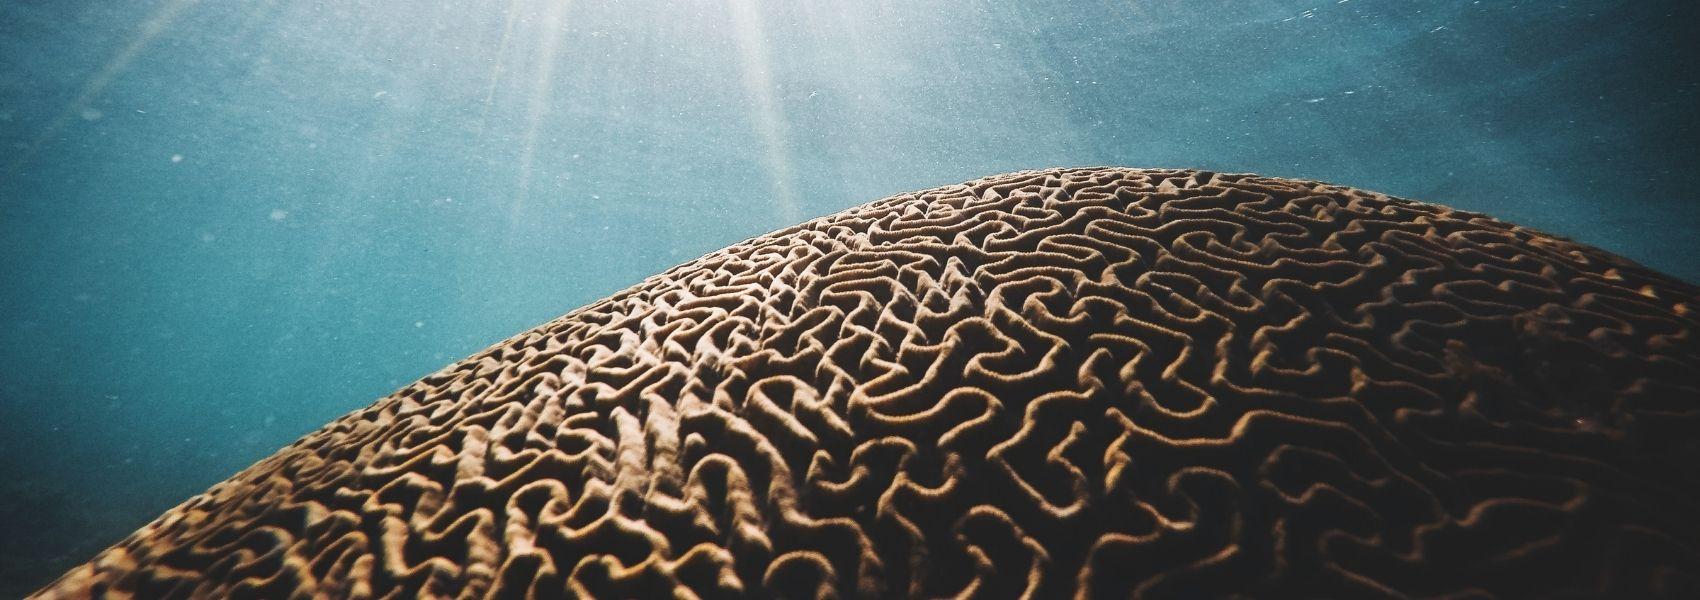 Dia Mundial do Cérebro sensibiliza para esclerose múltipla